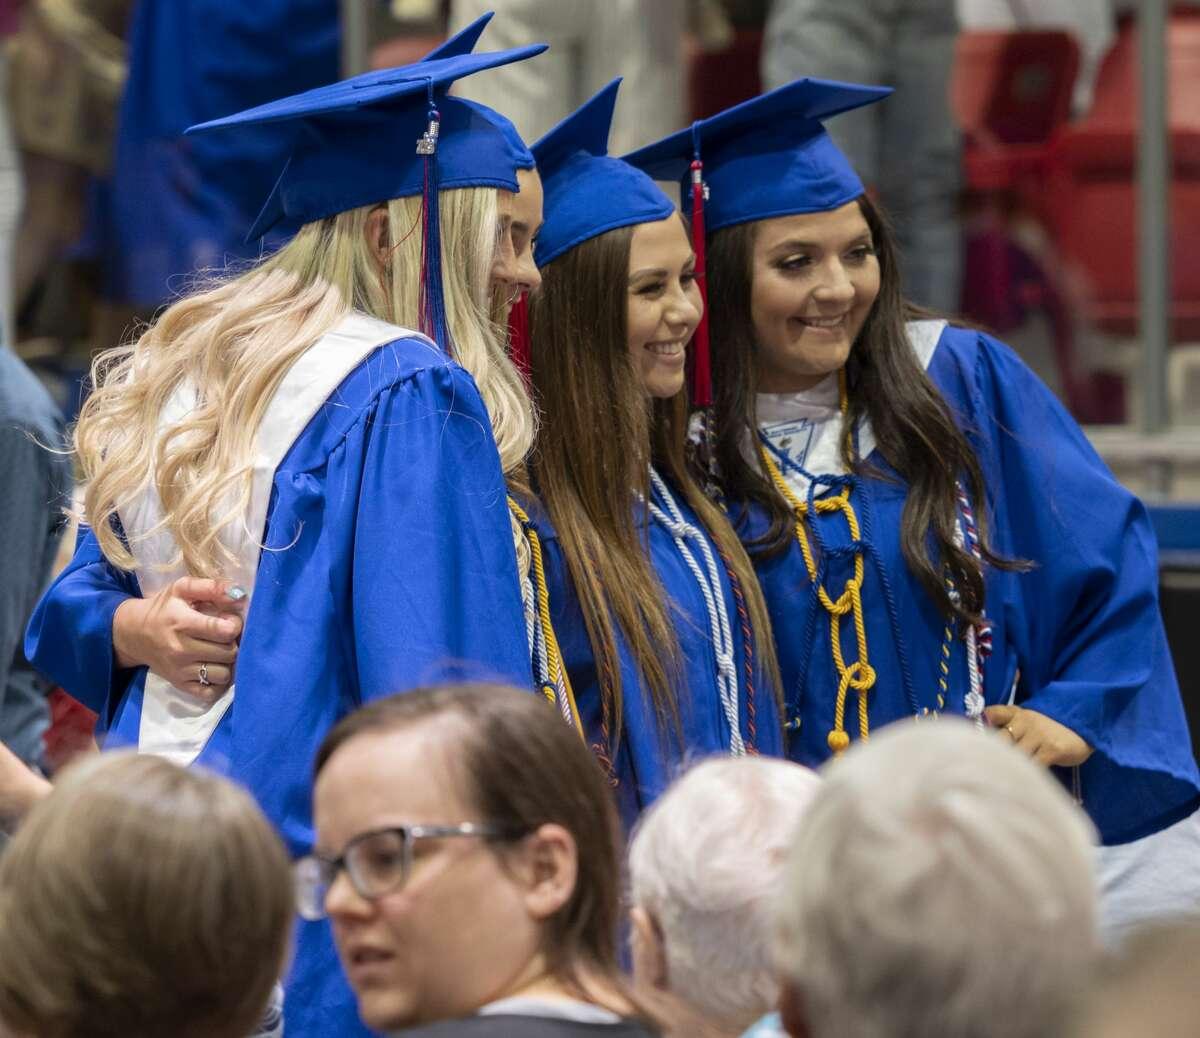 Midland Christian seniors hand out 05/24/19 evening before graduation ceremonies at McGraw Event Center. Tim Fischer/Reporter-Telegram